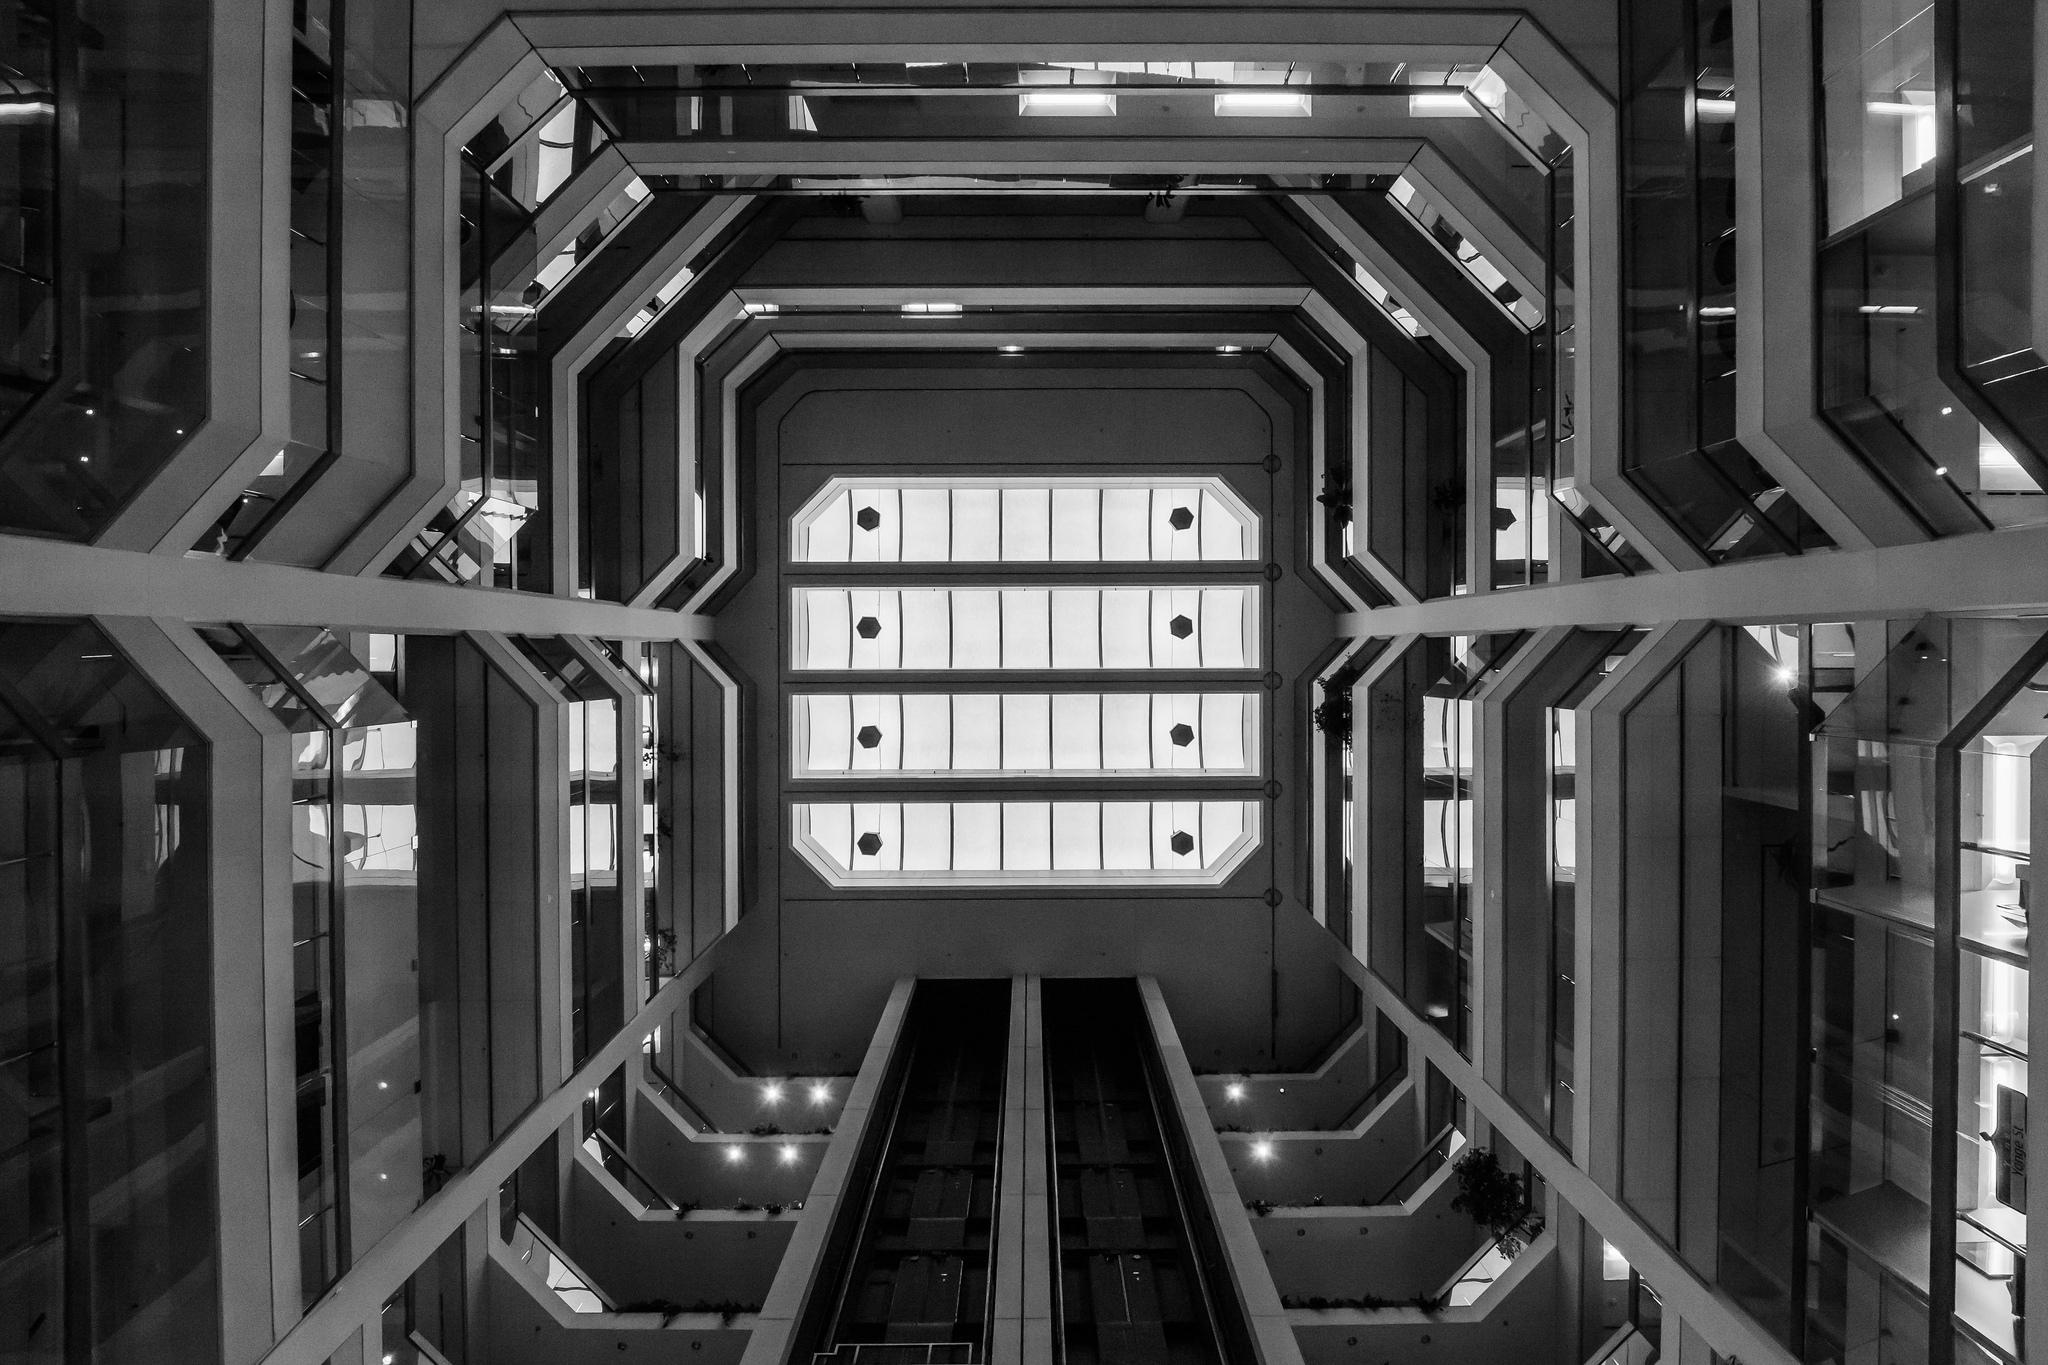 Atrium on Bay (1/100s, f8, ISO1600)